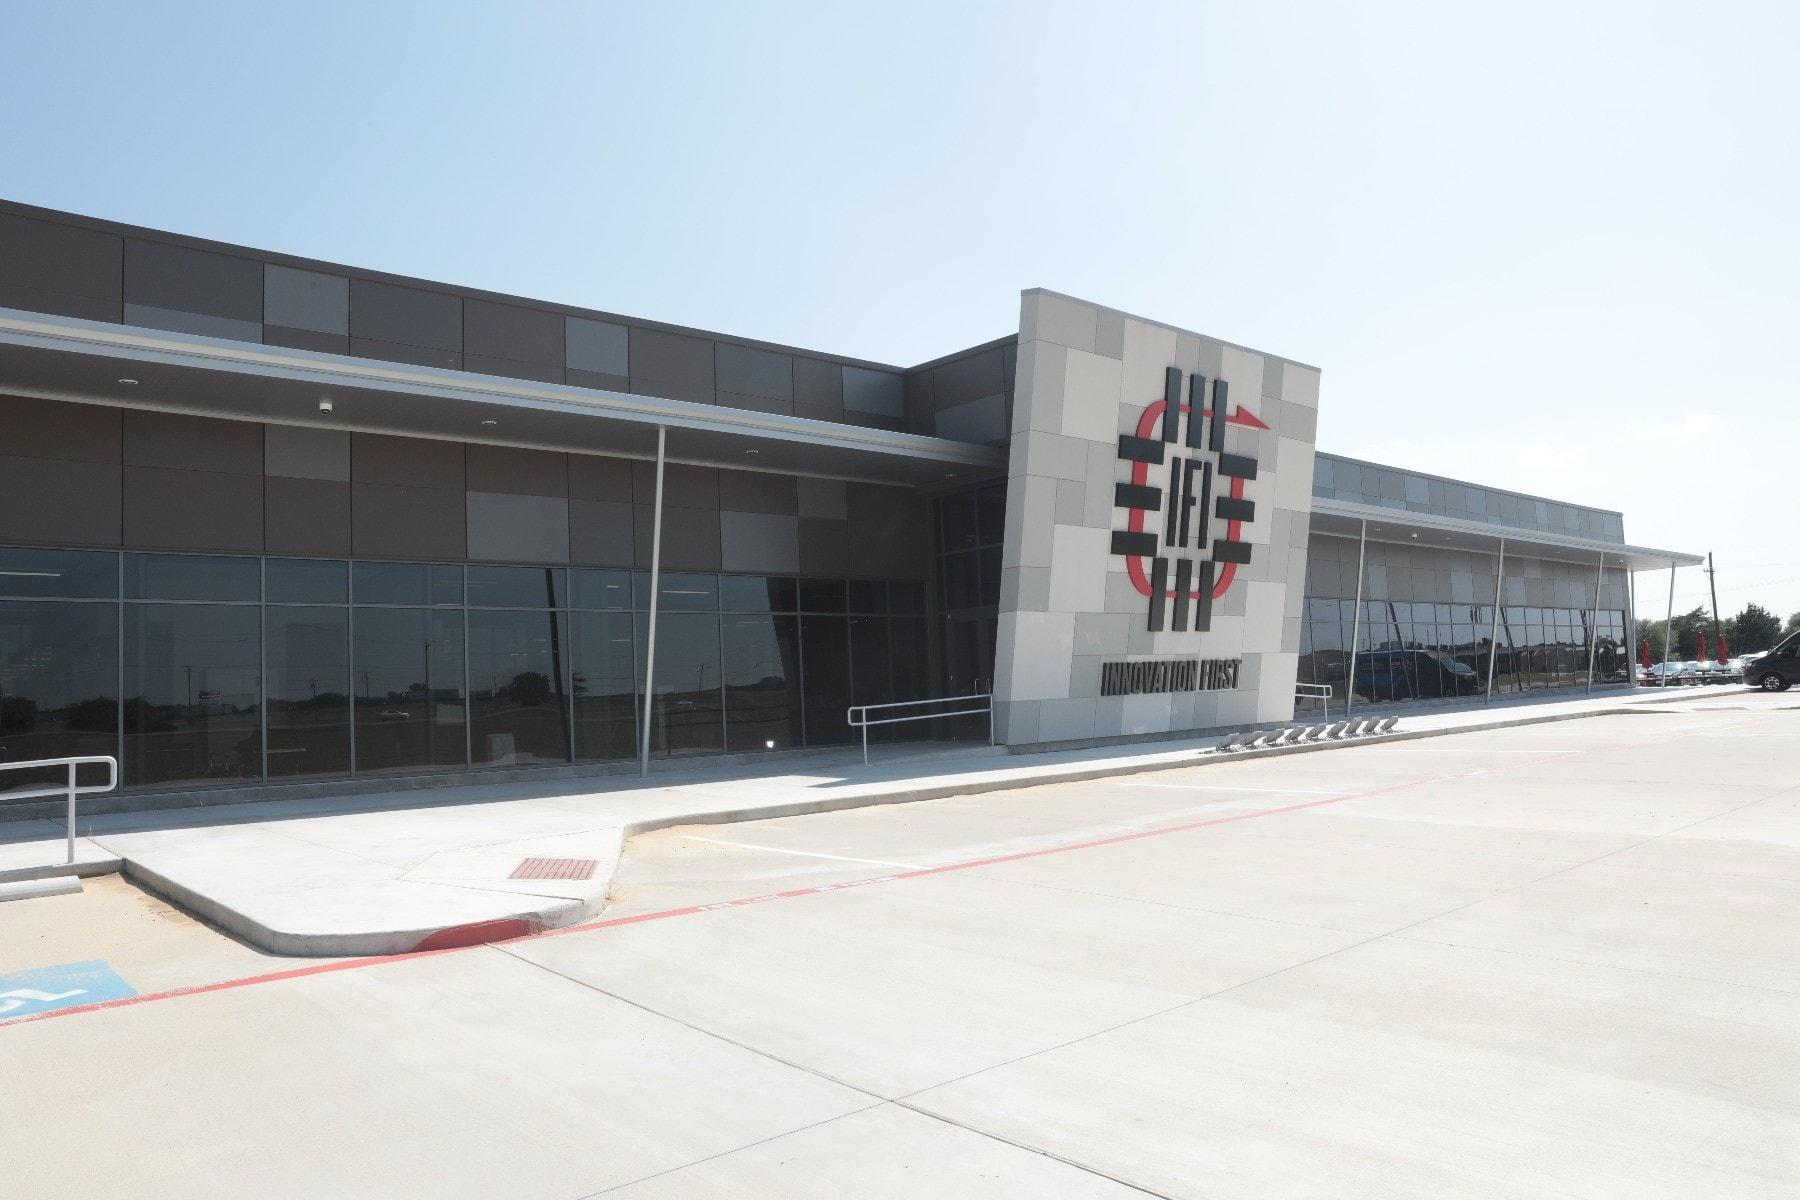 RackSolutions Main Office in Greenville Texas